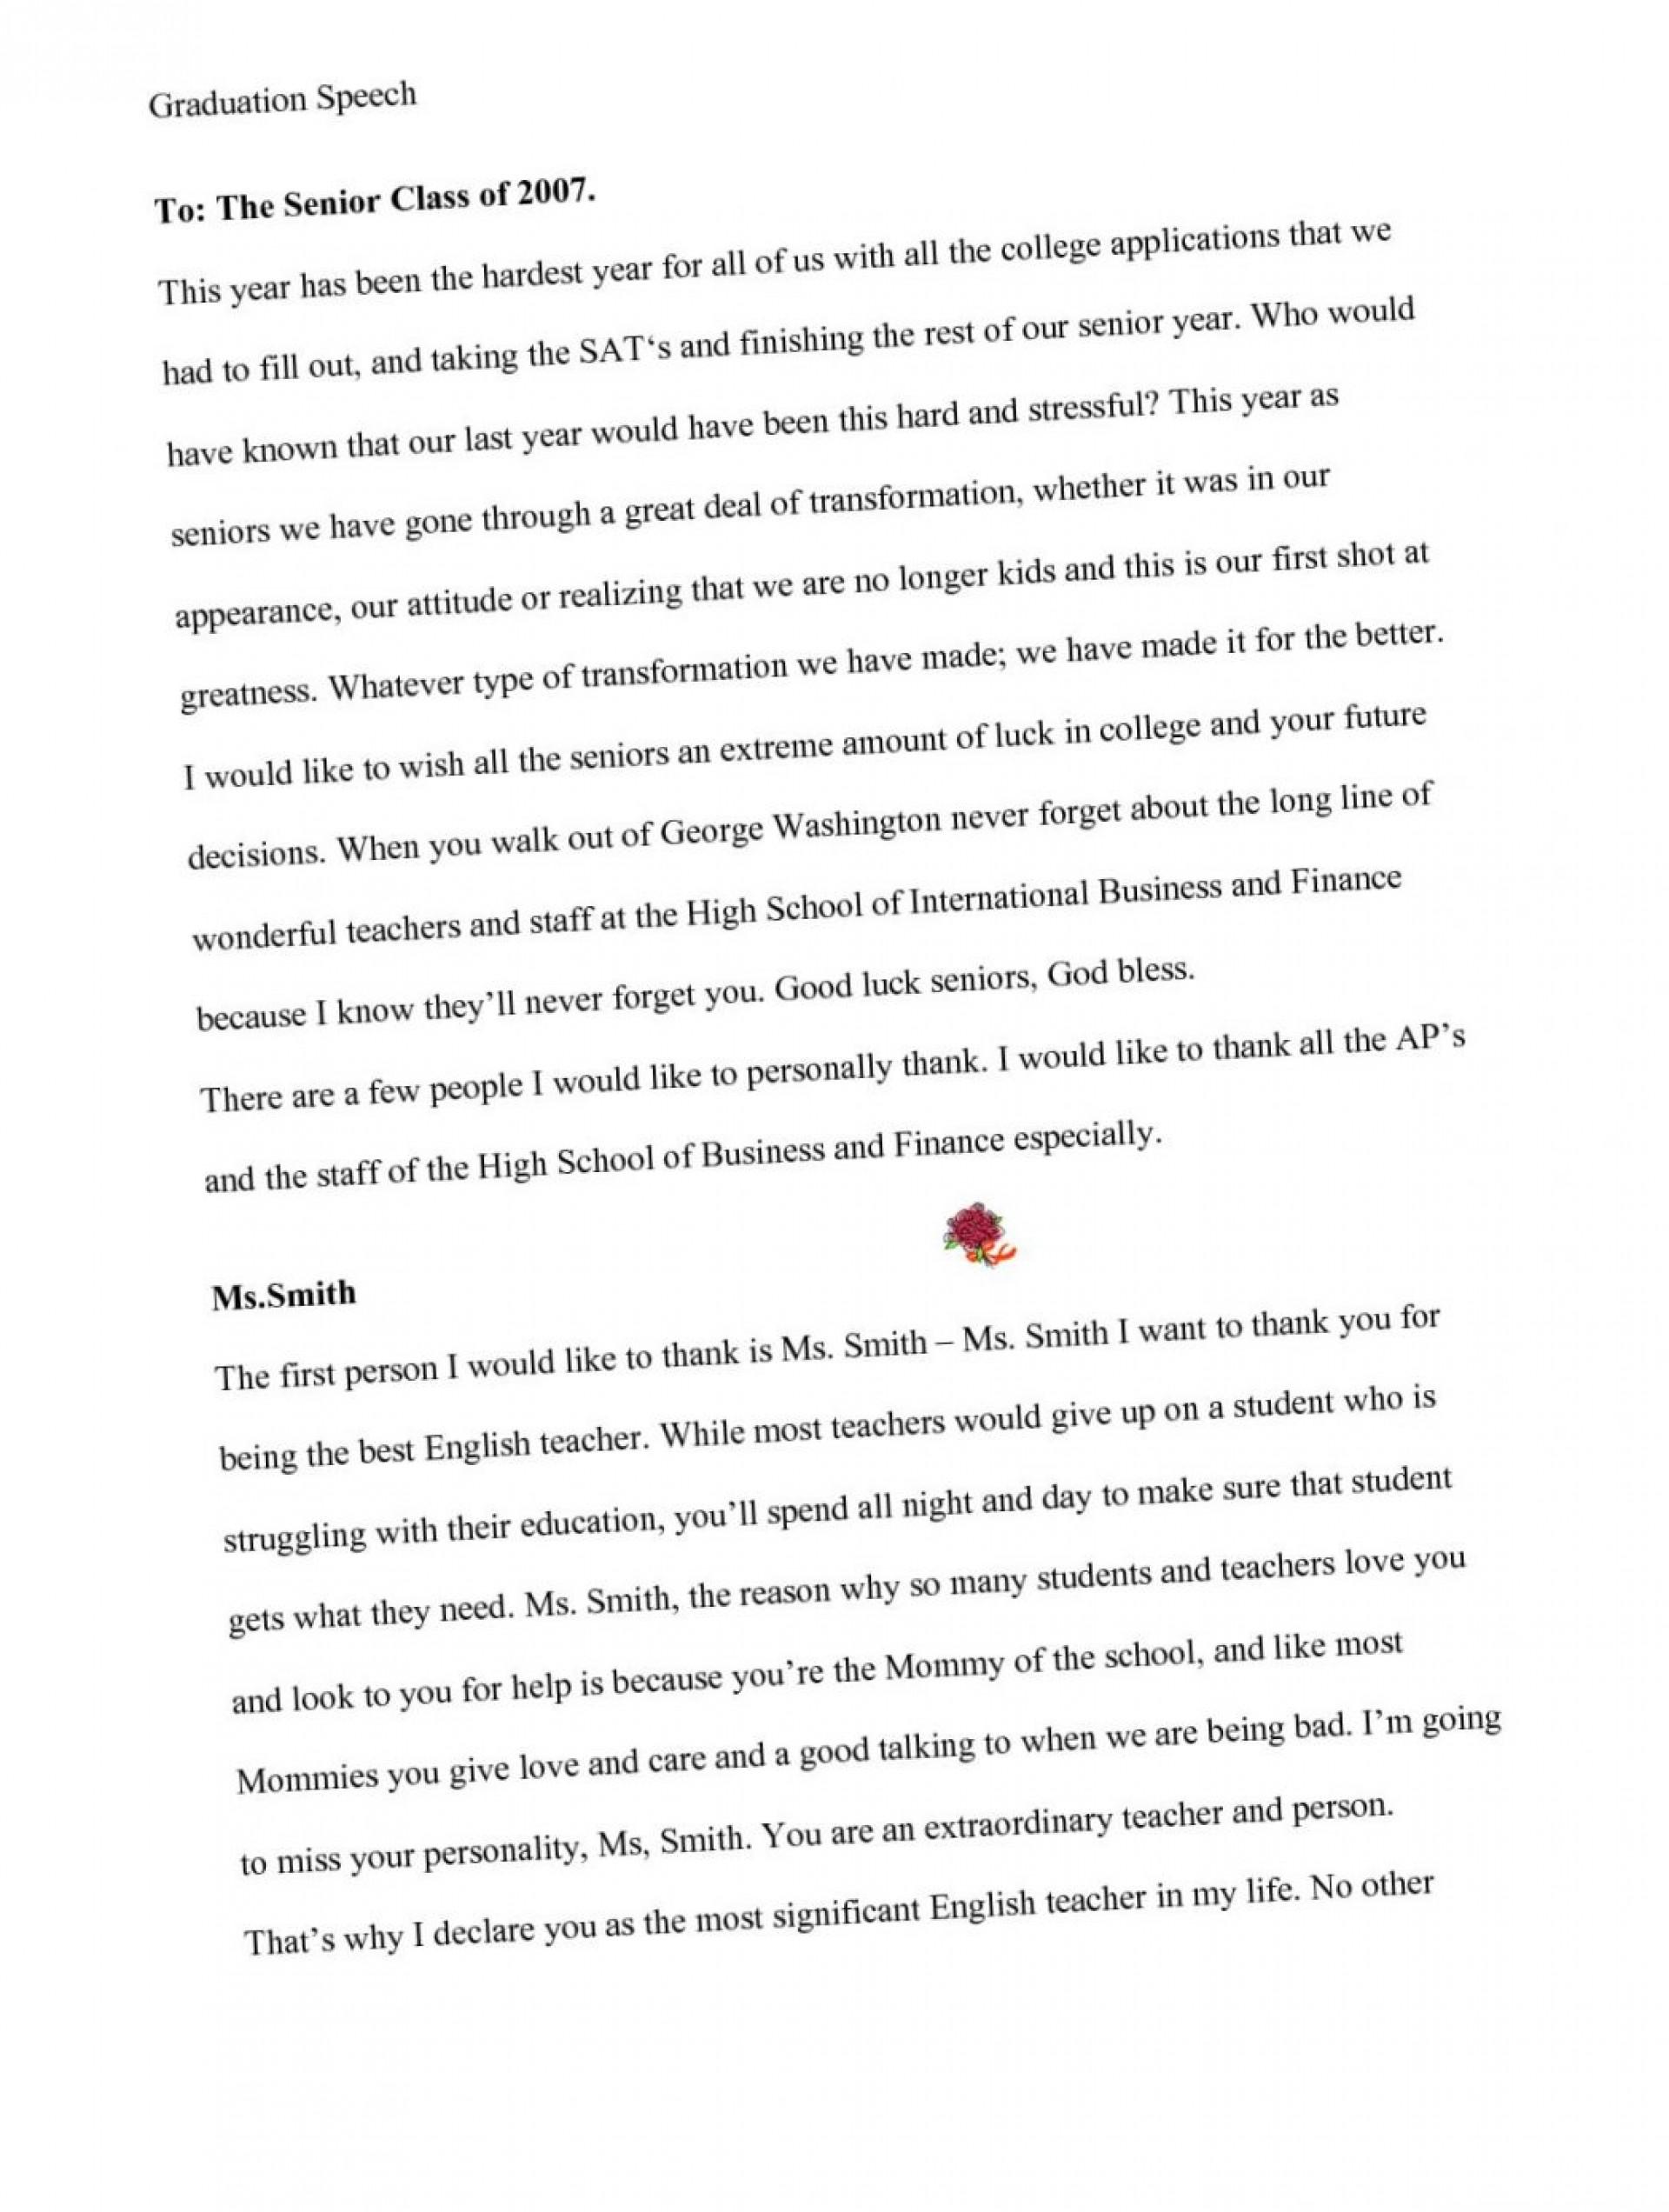 015 Starting Business Essay Graduating High School Wwwgxartorg Writing Service 1048x1389 Example Rare Graduation Day Ceremony 1920